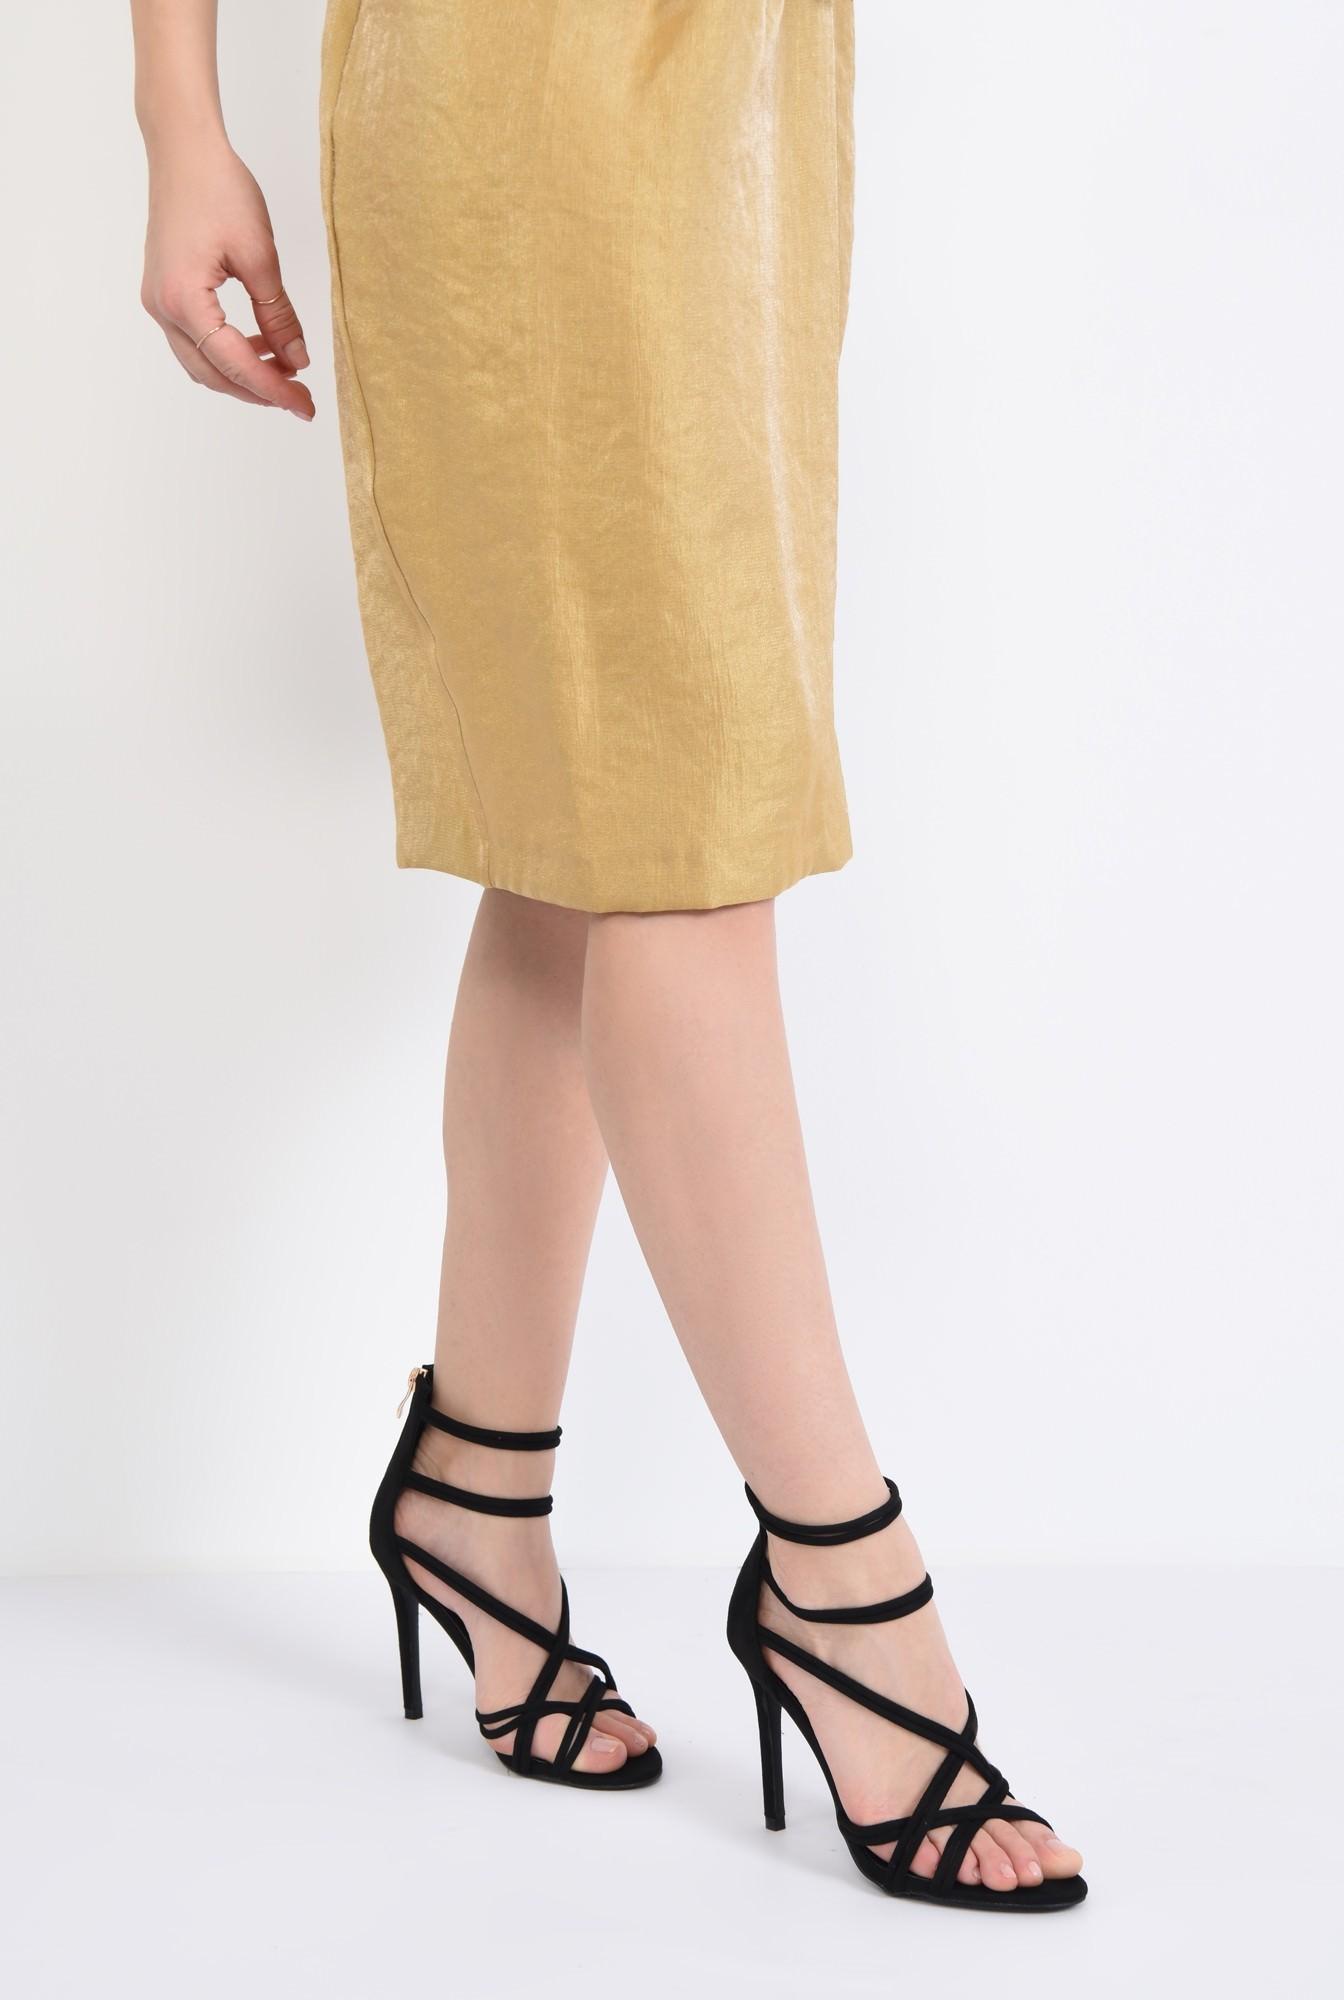 4 - sandale elegante, negre, catifea, stiletto